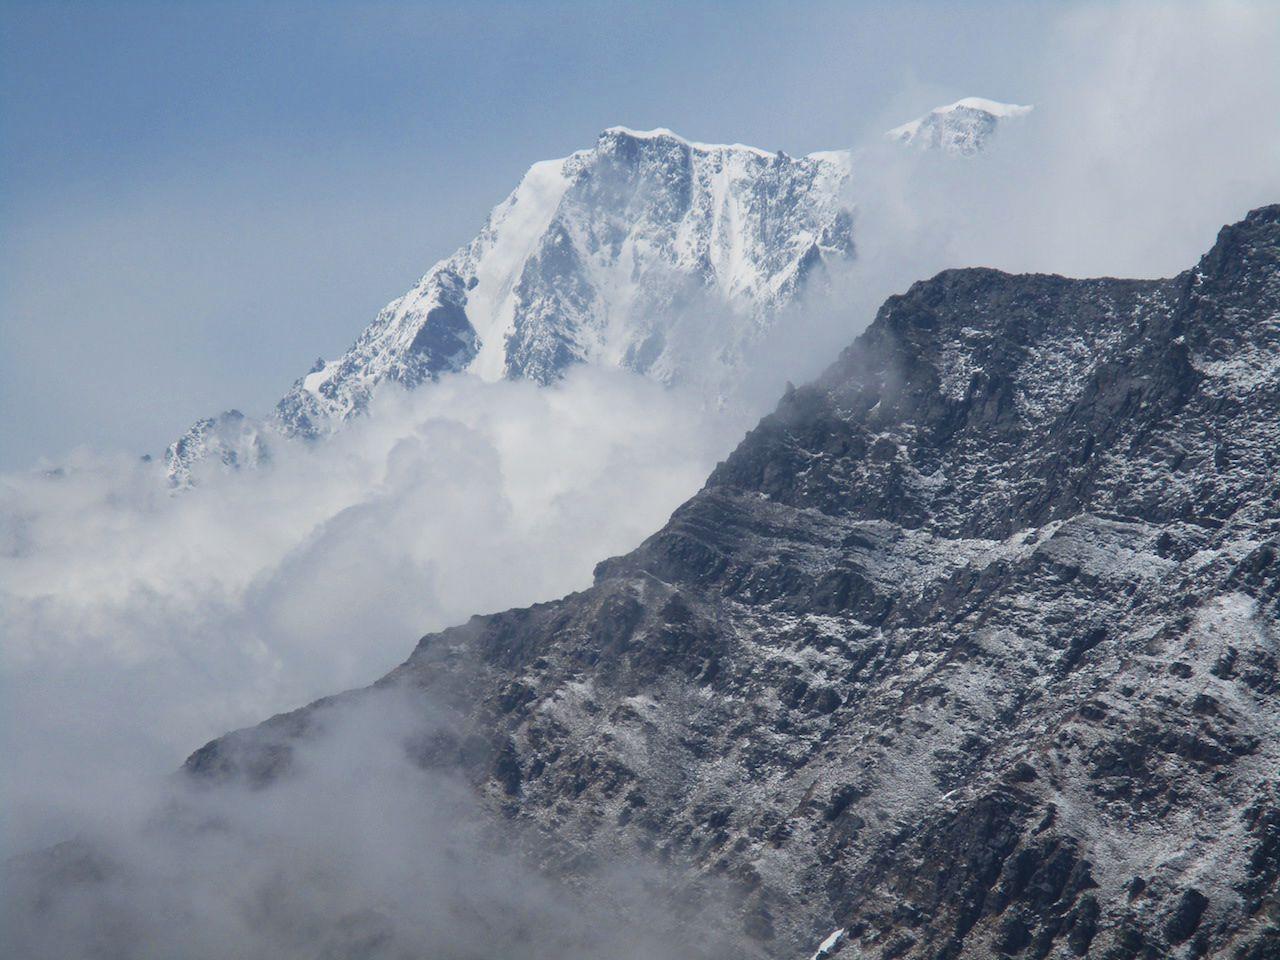 ridges of trishul massif with fog floating below